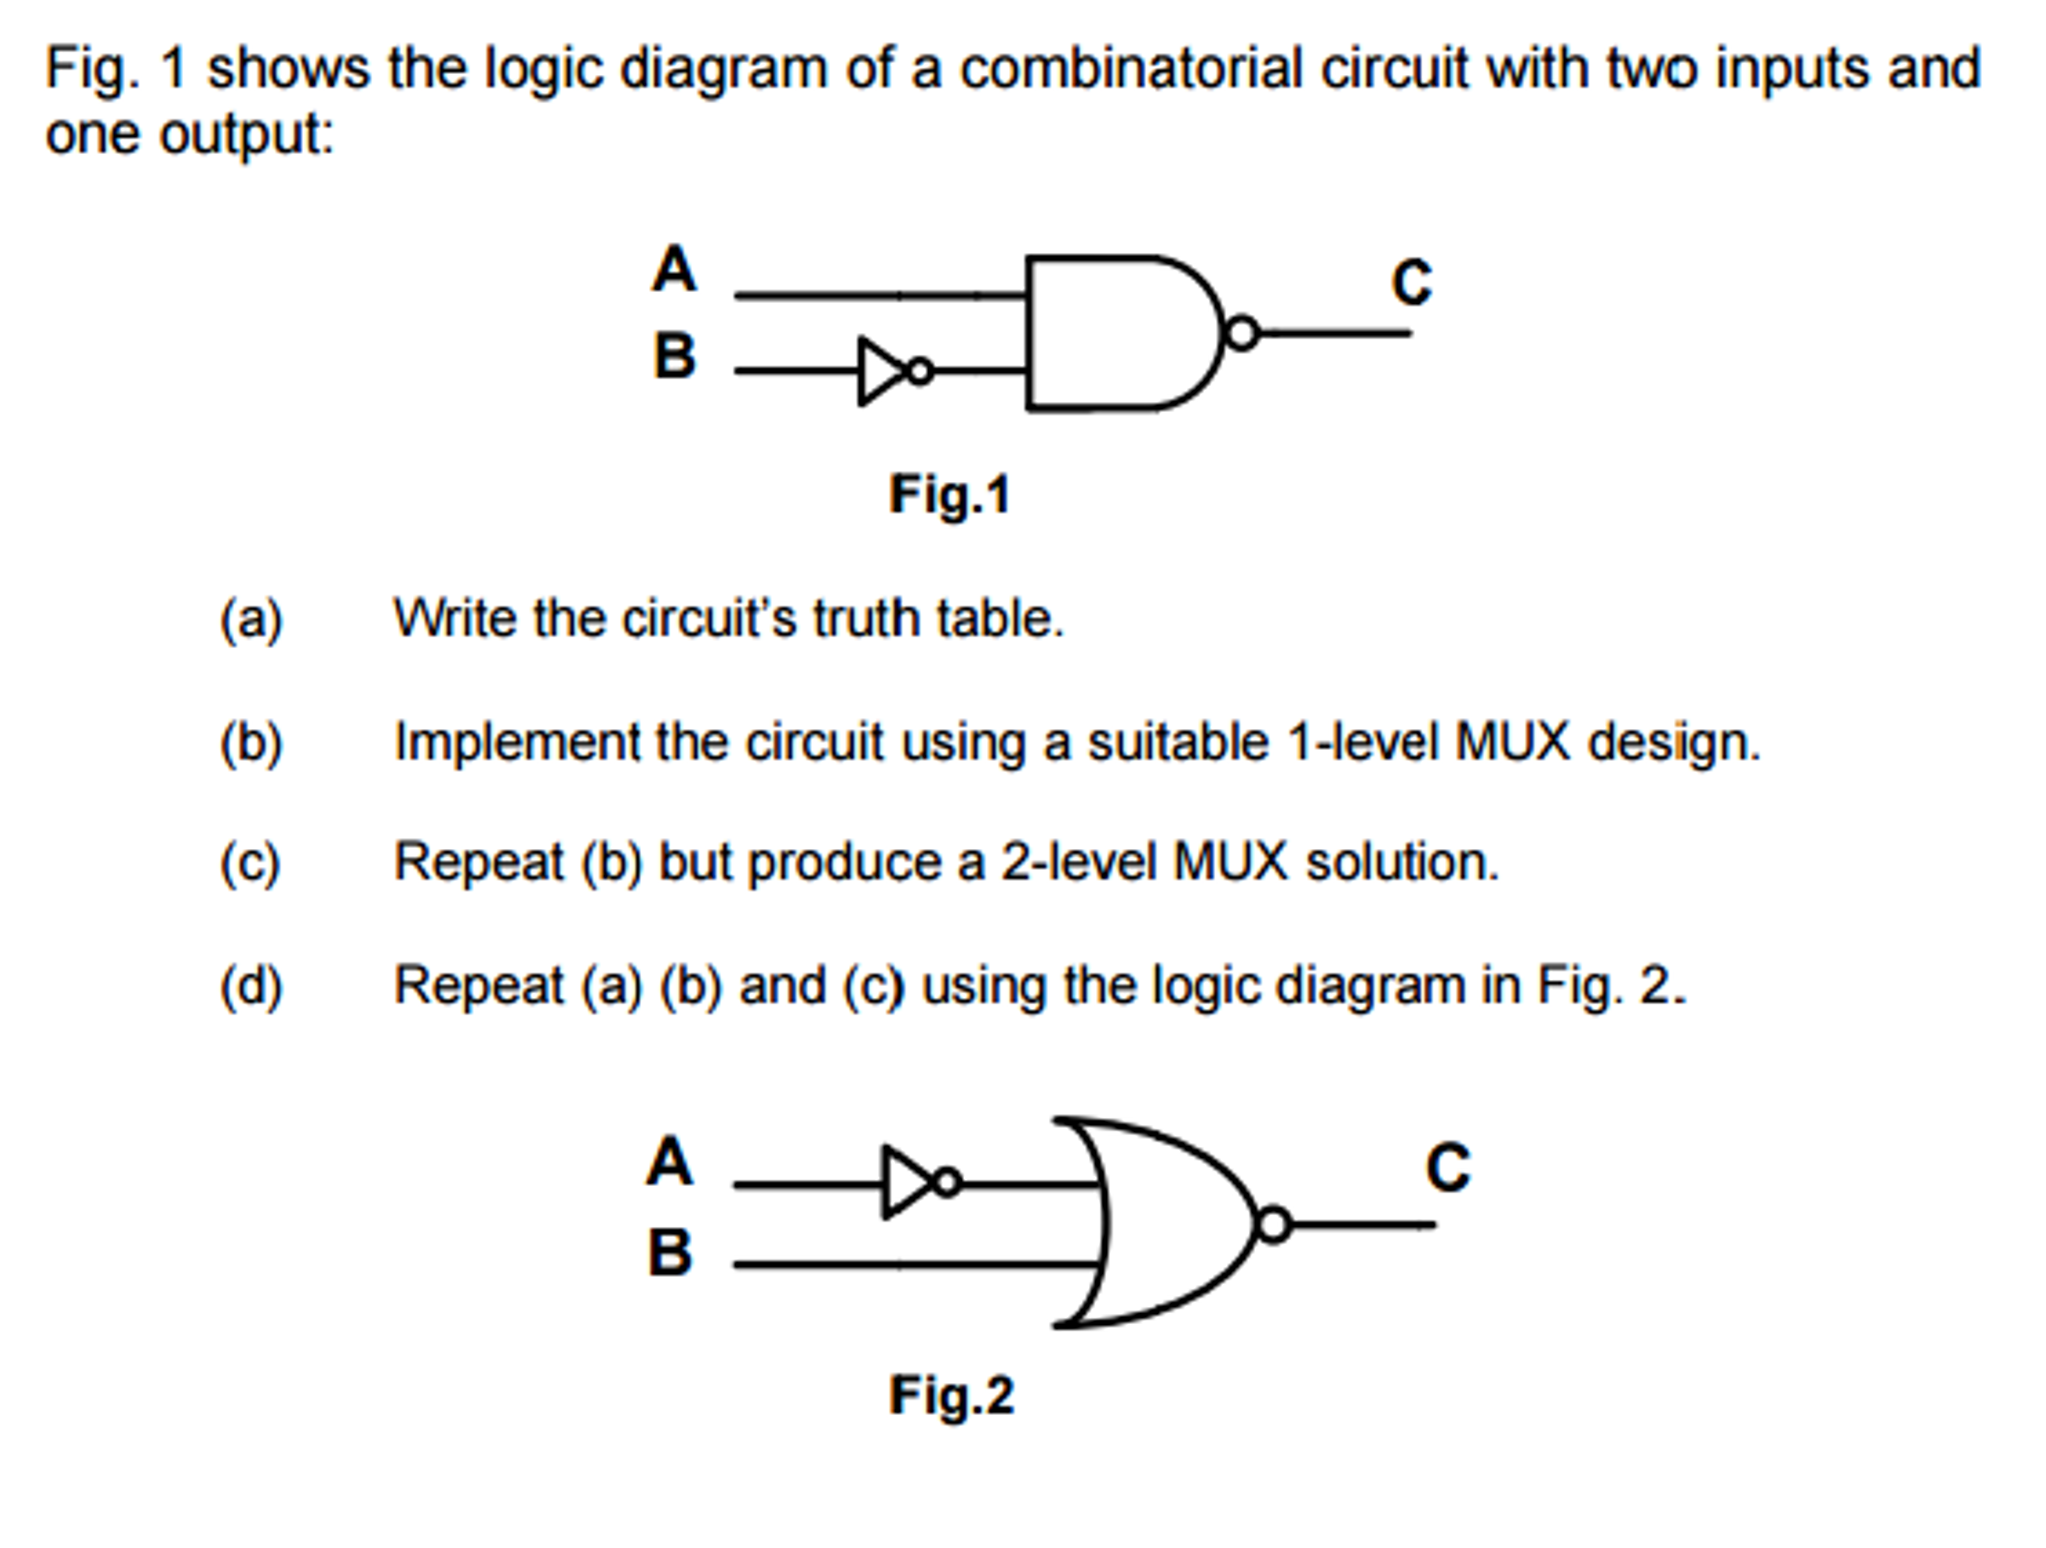 Level one data flow diagram hvac components diagram er model notation 2 level logic diagram wiring diagram with description media2f3a02f3a0b6989 45af 4571 906e ccuart Image collections